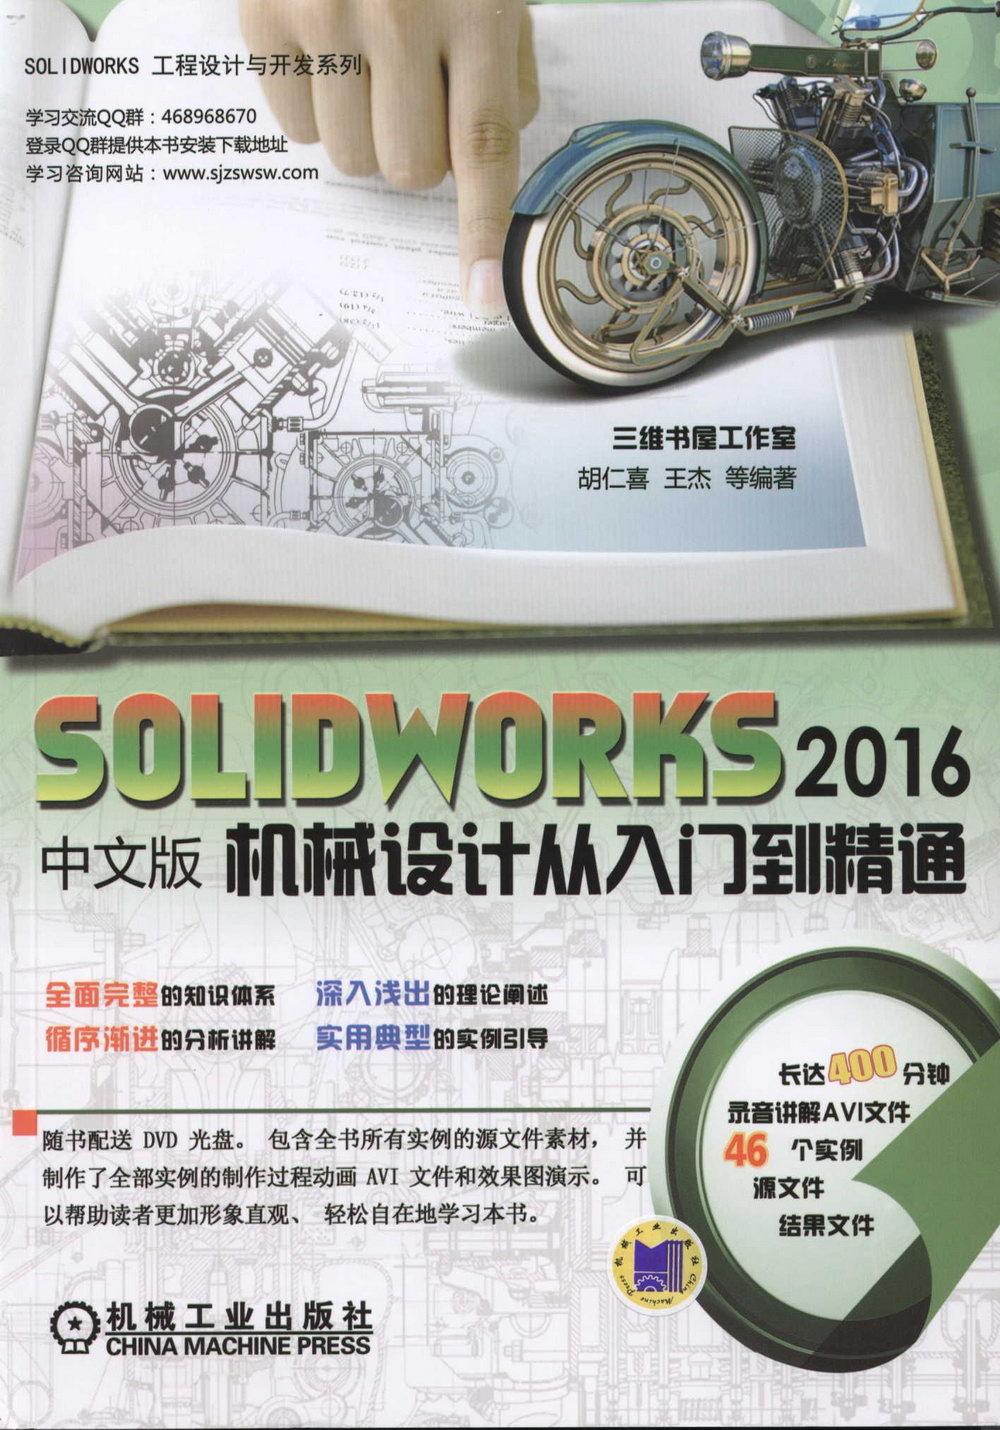 SOLIDWORKS 2016中文版機械設計從入門到精通